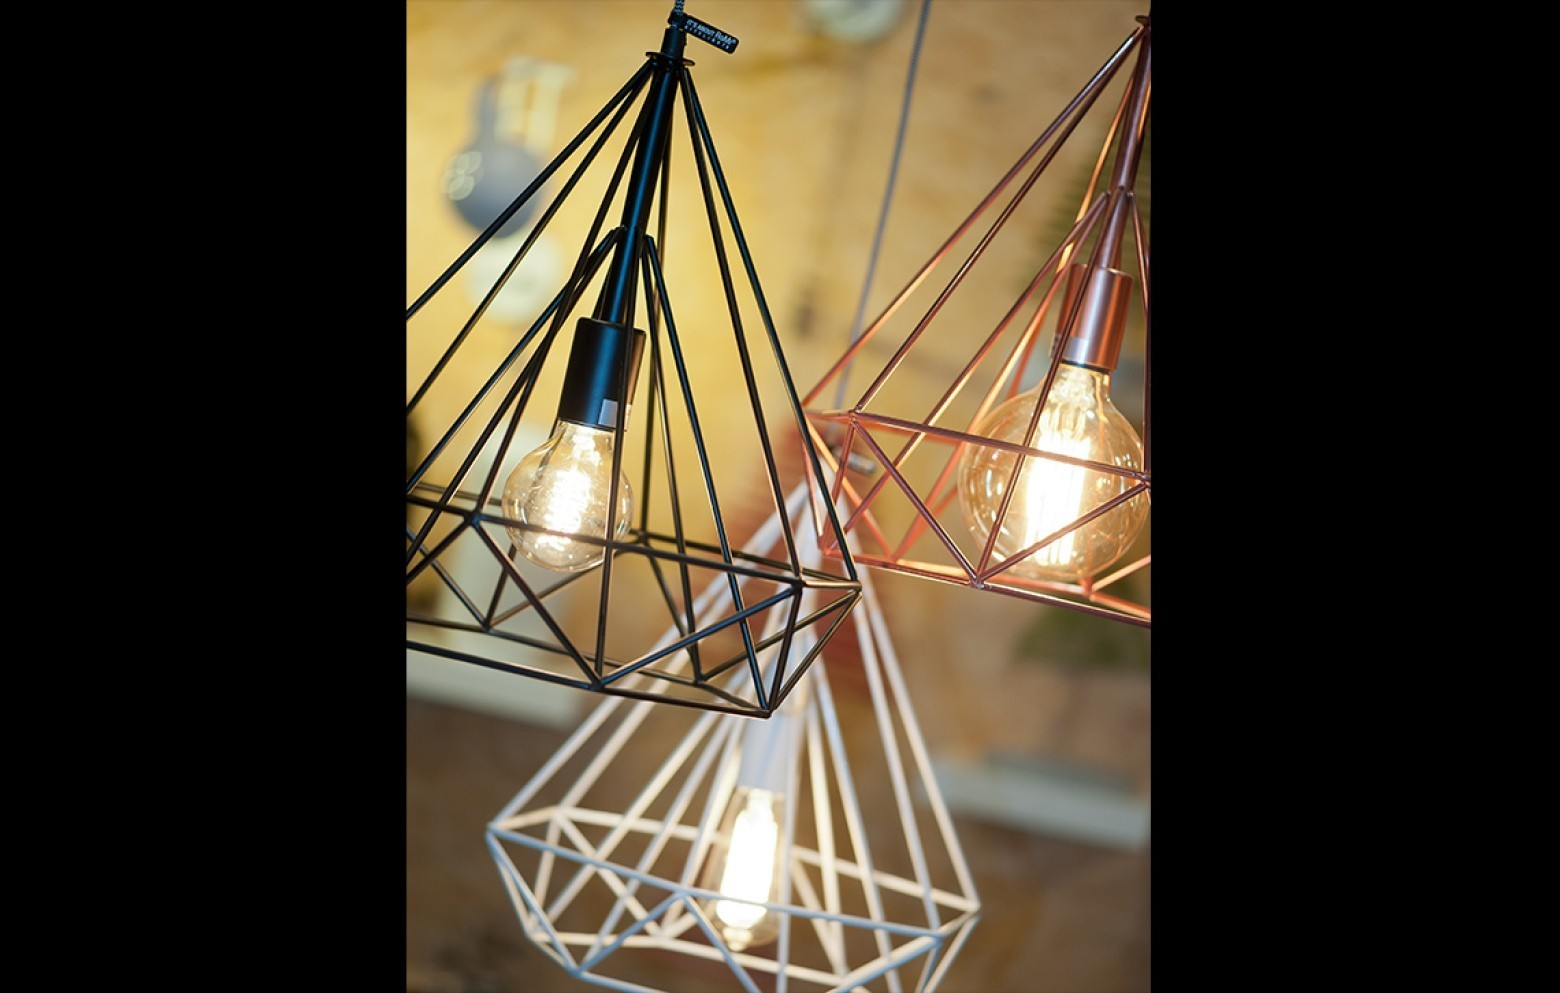 antwerp lampen kleinm bel accessoires who 39 s perfect. Black Bedroom Furniture Sets. Home Design Ideas